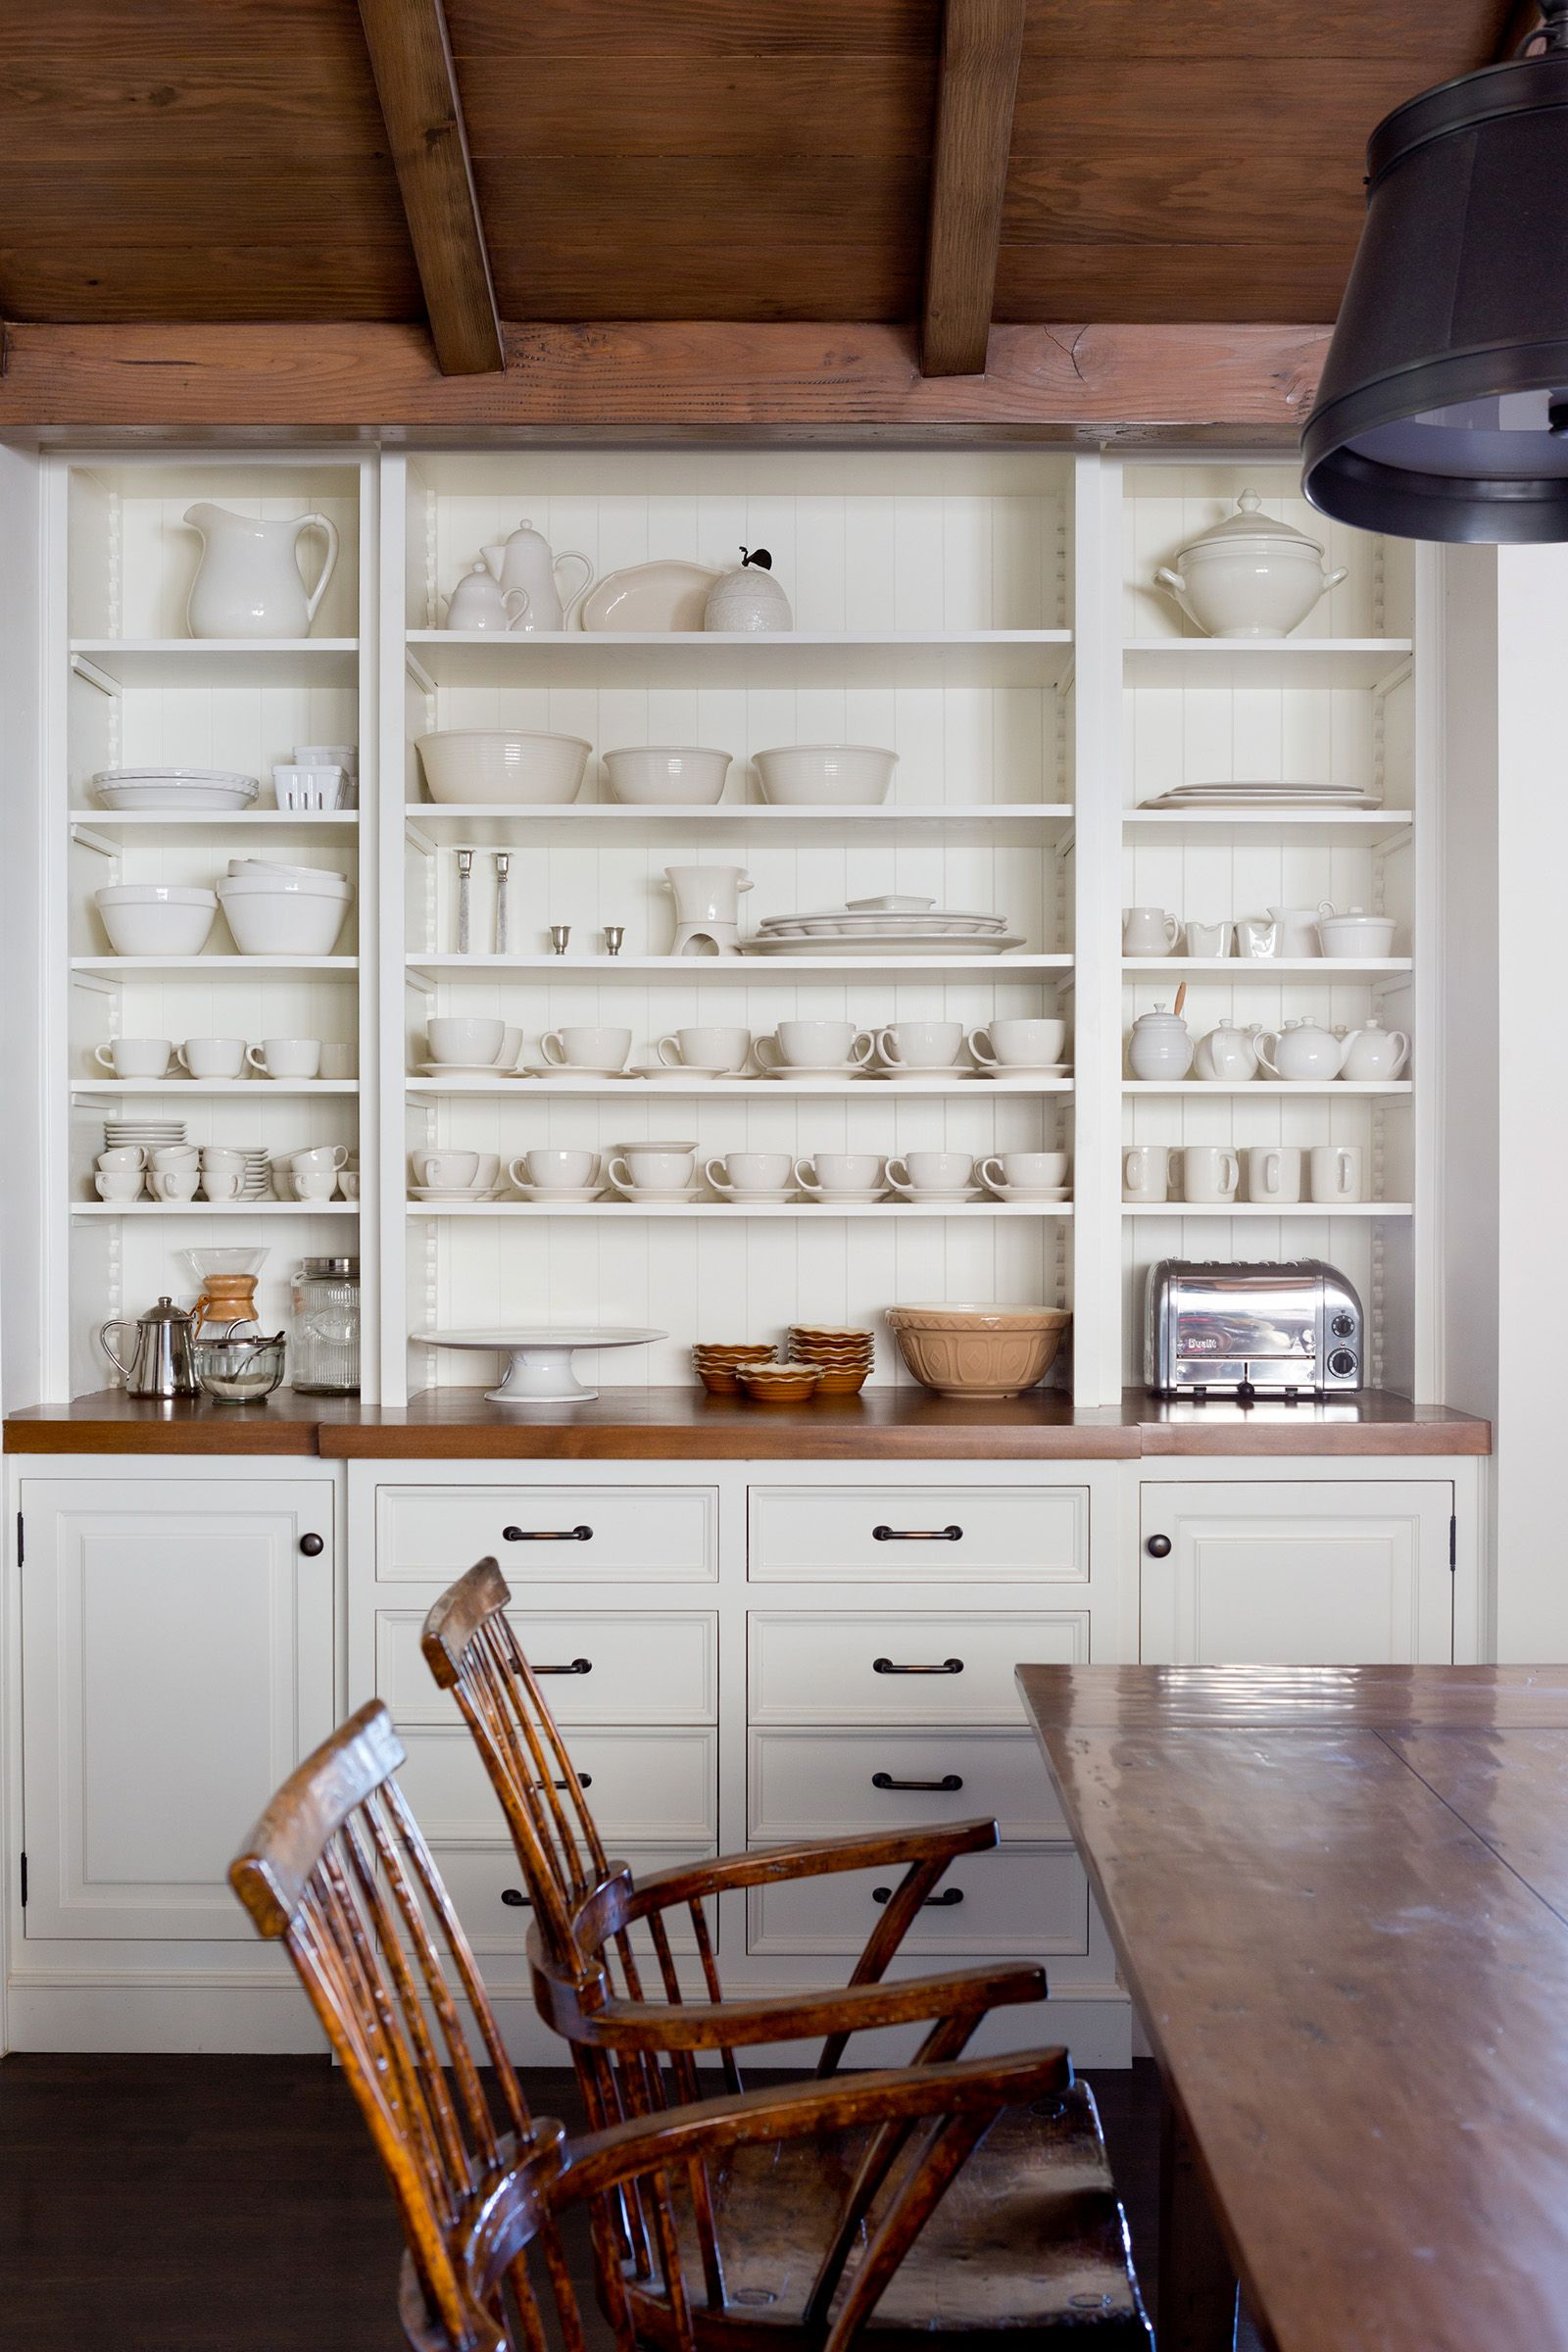 traditional working kitchen kellybaron upper cabinets kitchen kitchen storage on kitchen cabinets upper id=98824